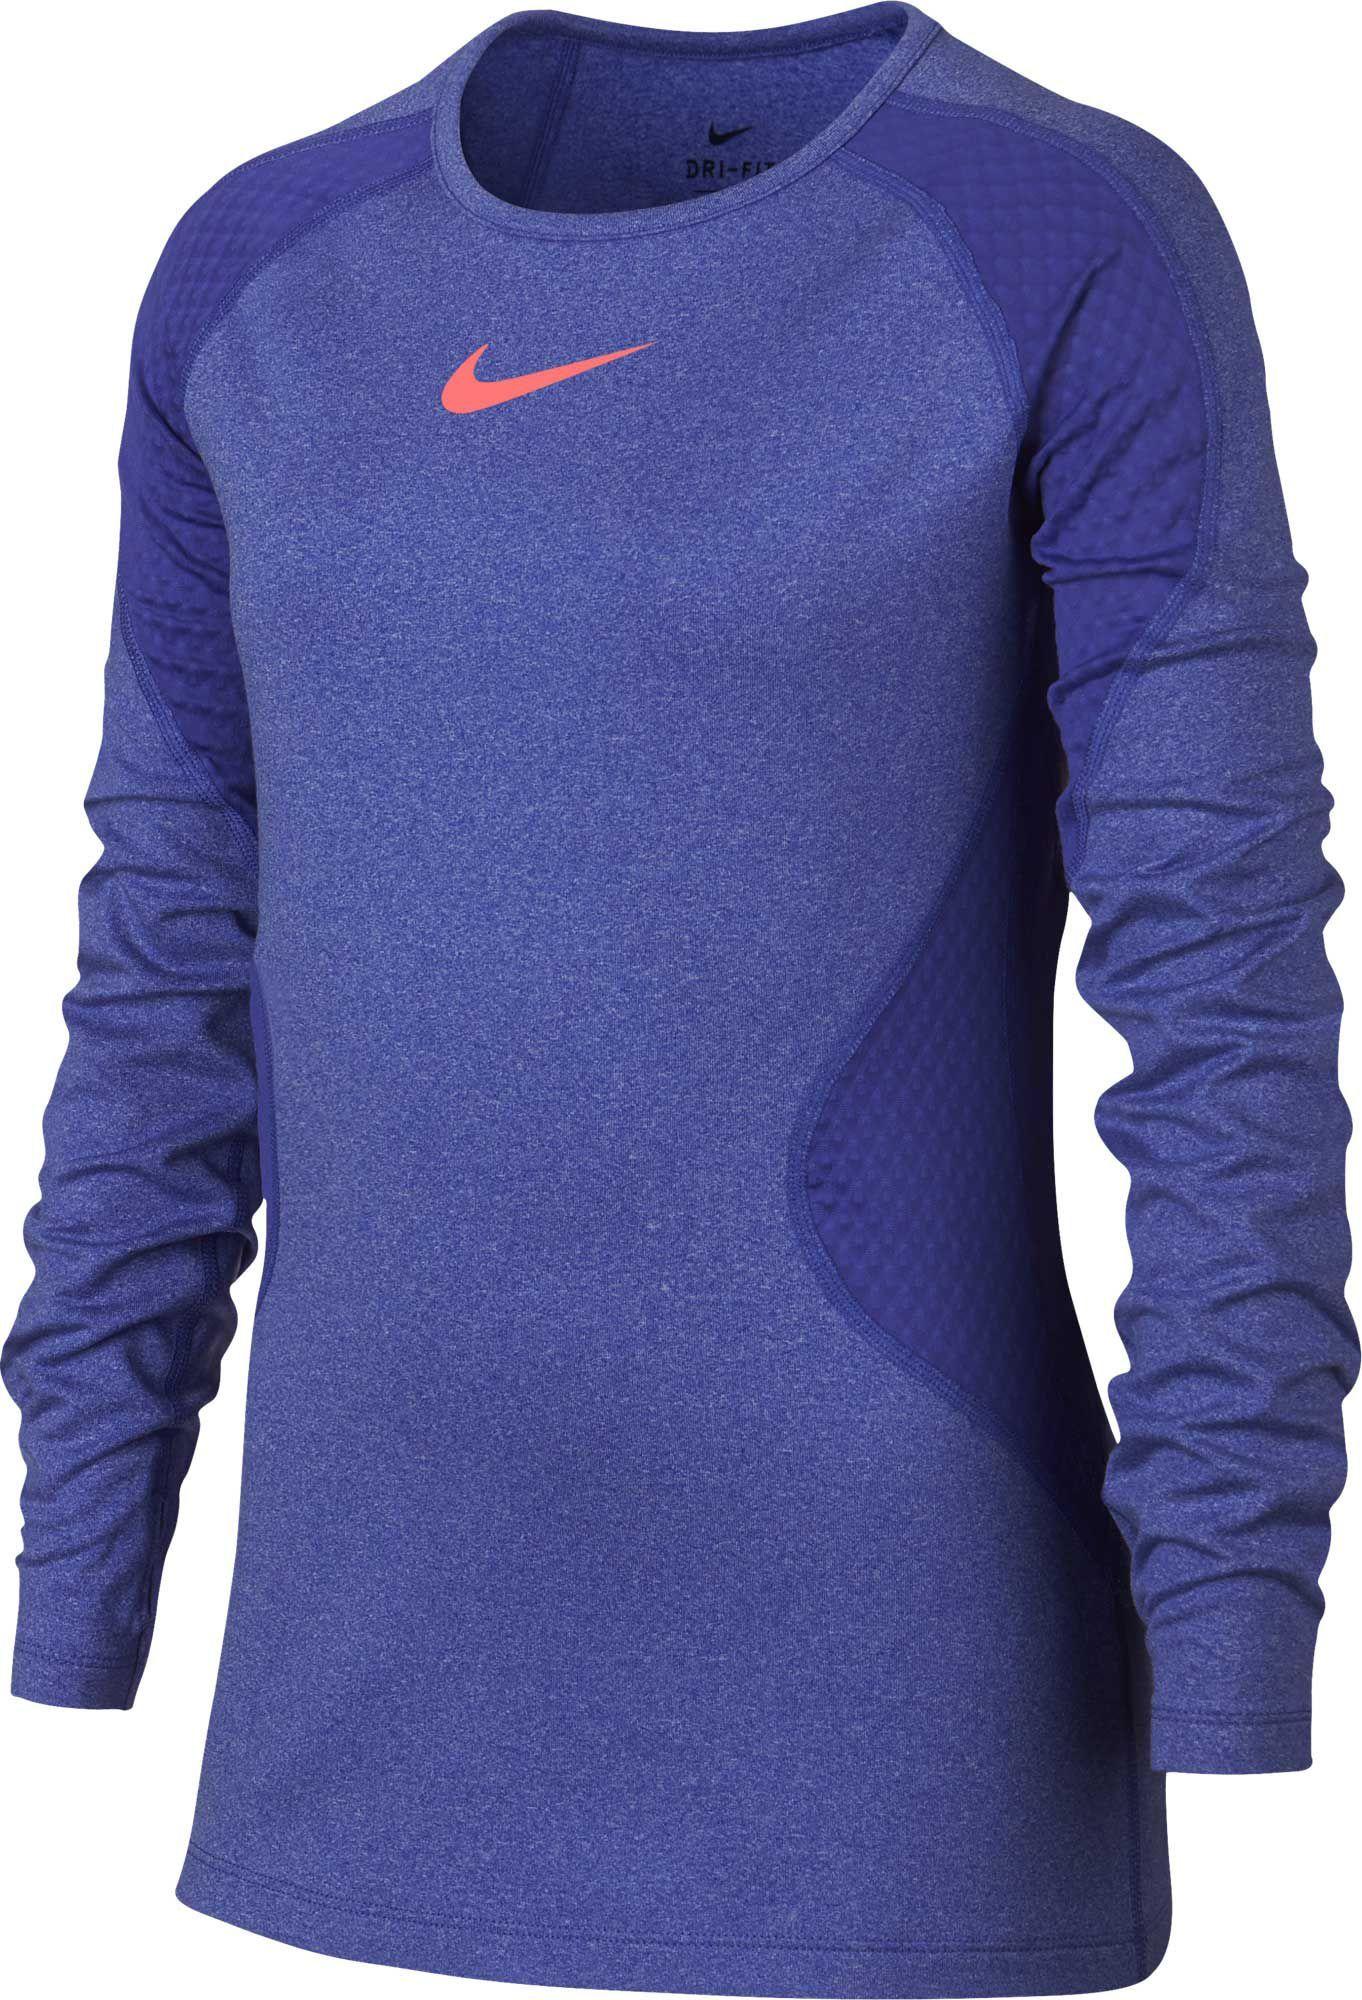 0eef4b5168110 Nike Girls  Warm Dri-FIT Long Sleeve Training Shirt